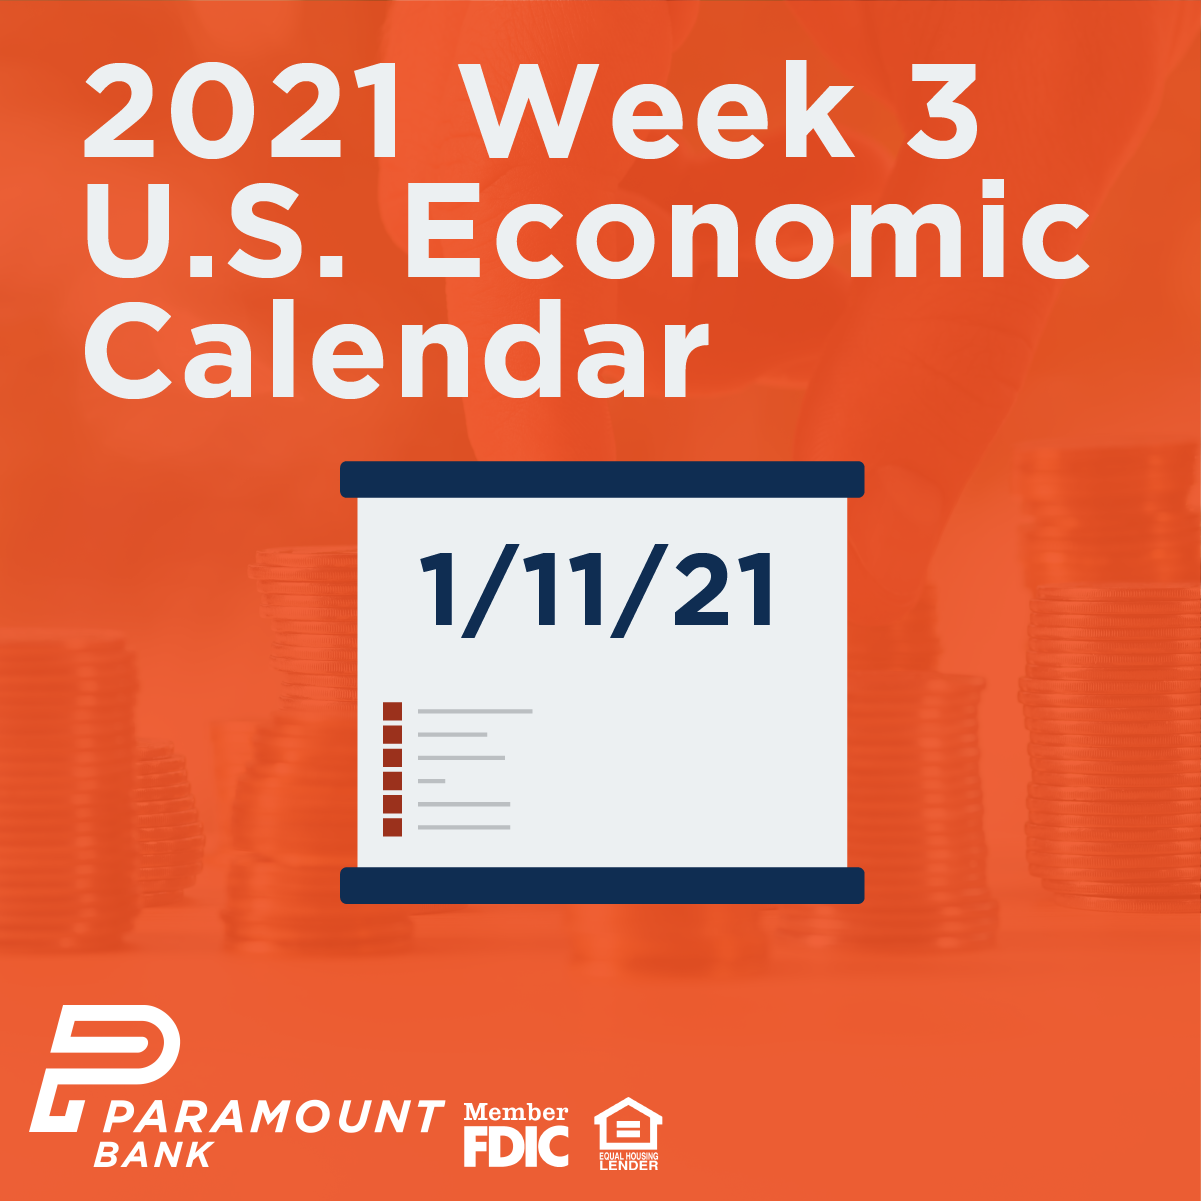 Economic Calendar 2021 2021 Week 3 U.S. Economic Calendar   Paramount Bank 2021 Week 3